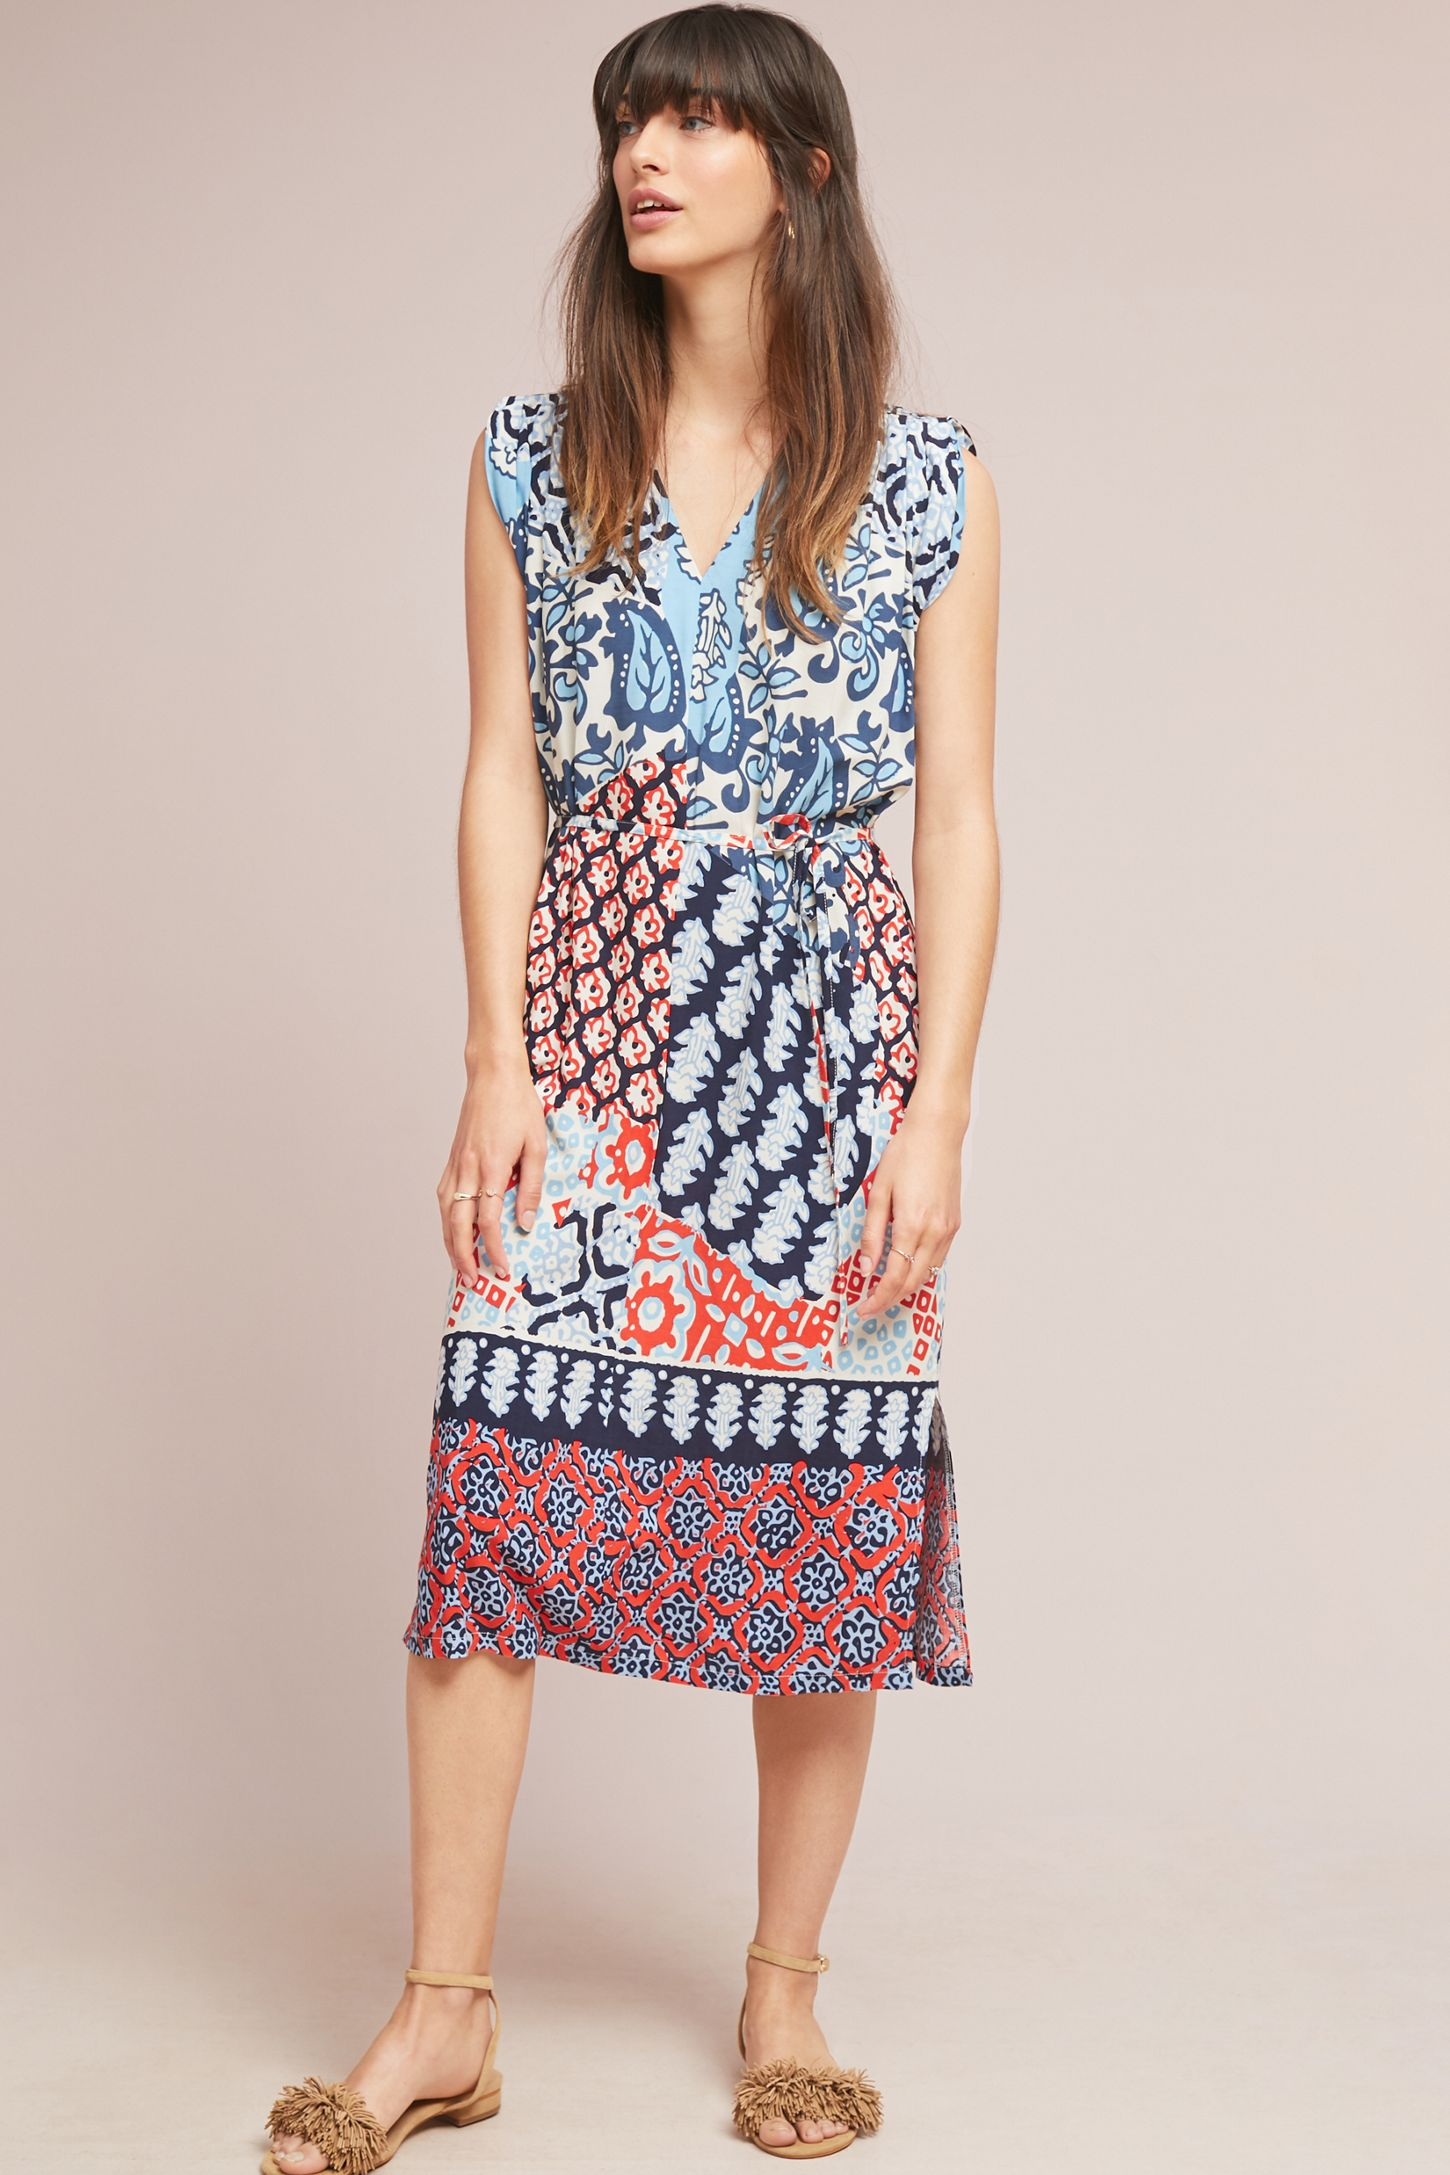 2a6c20ec82b9 Patchwork Midi Dress   Anthropologie